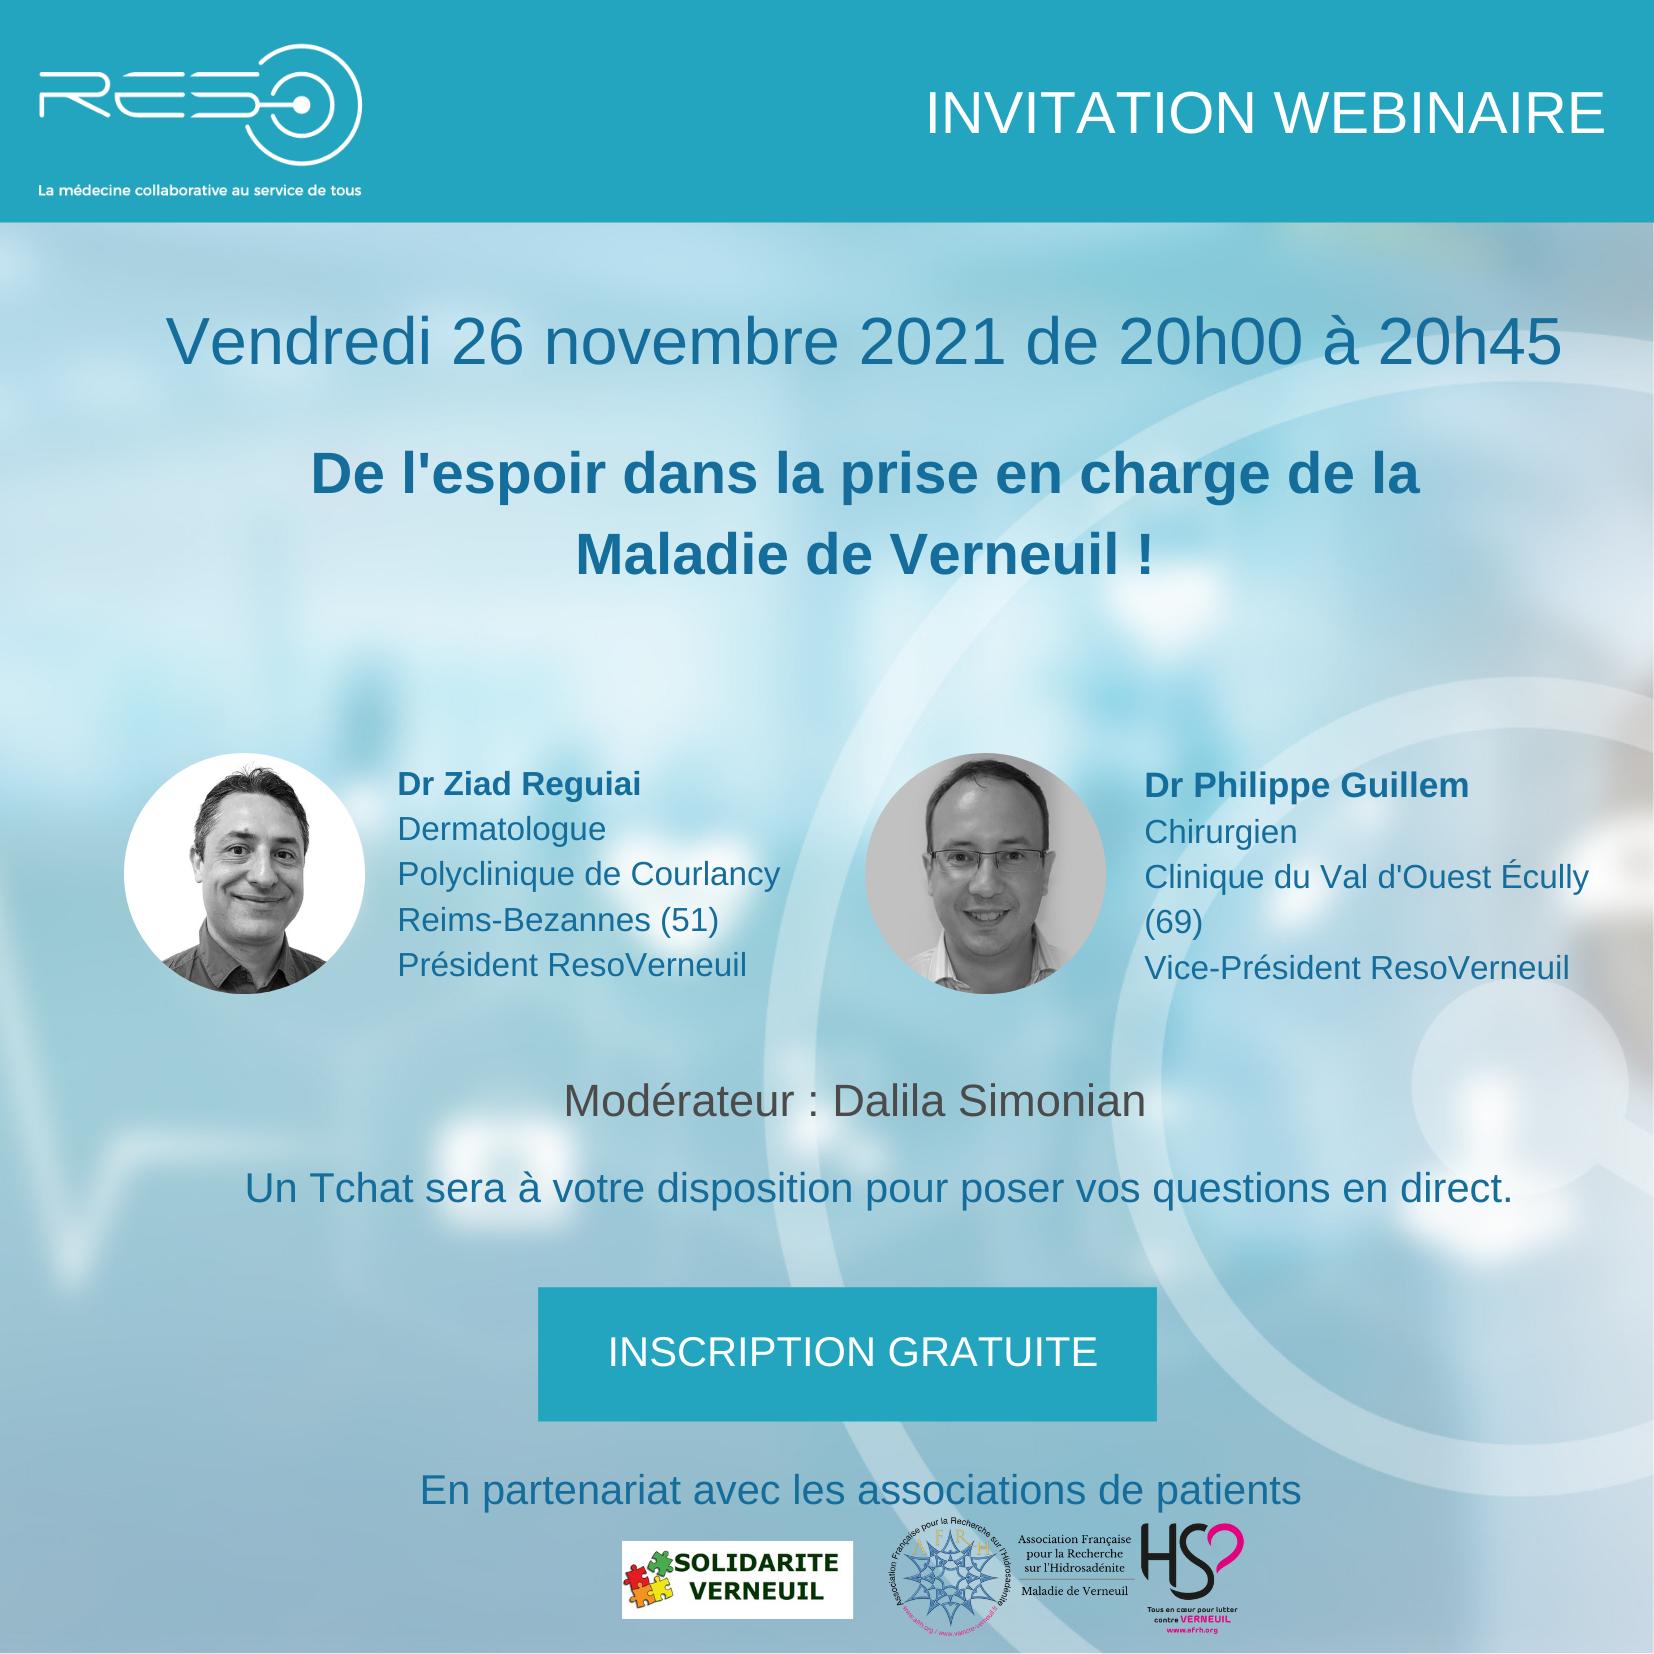 WEBINAIRE RESO INVITATION 26112021